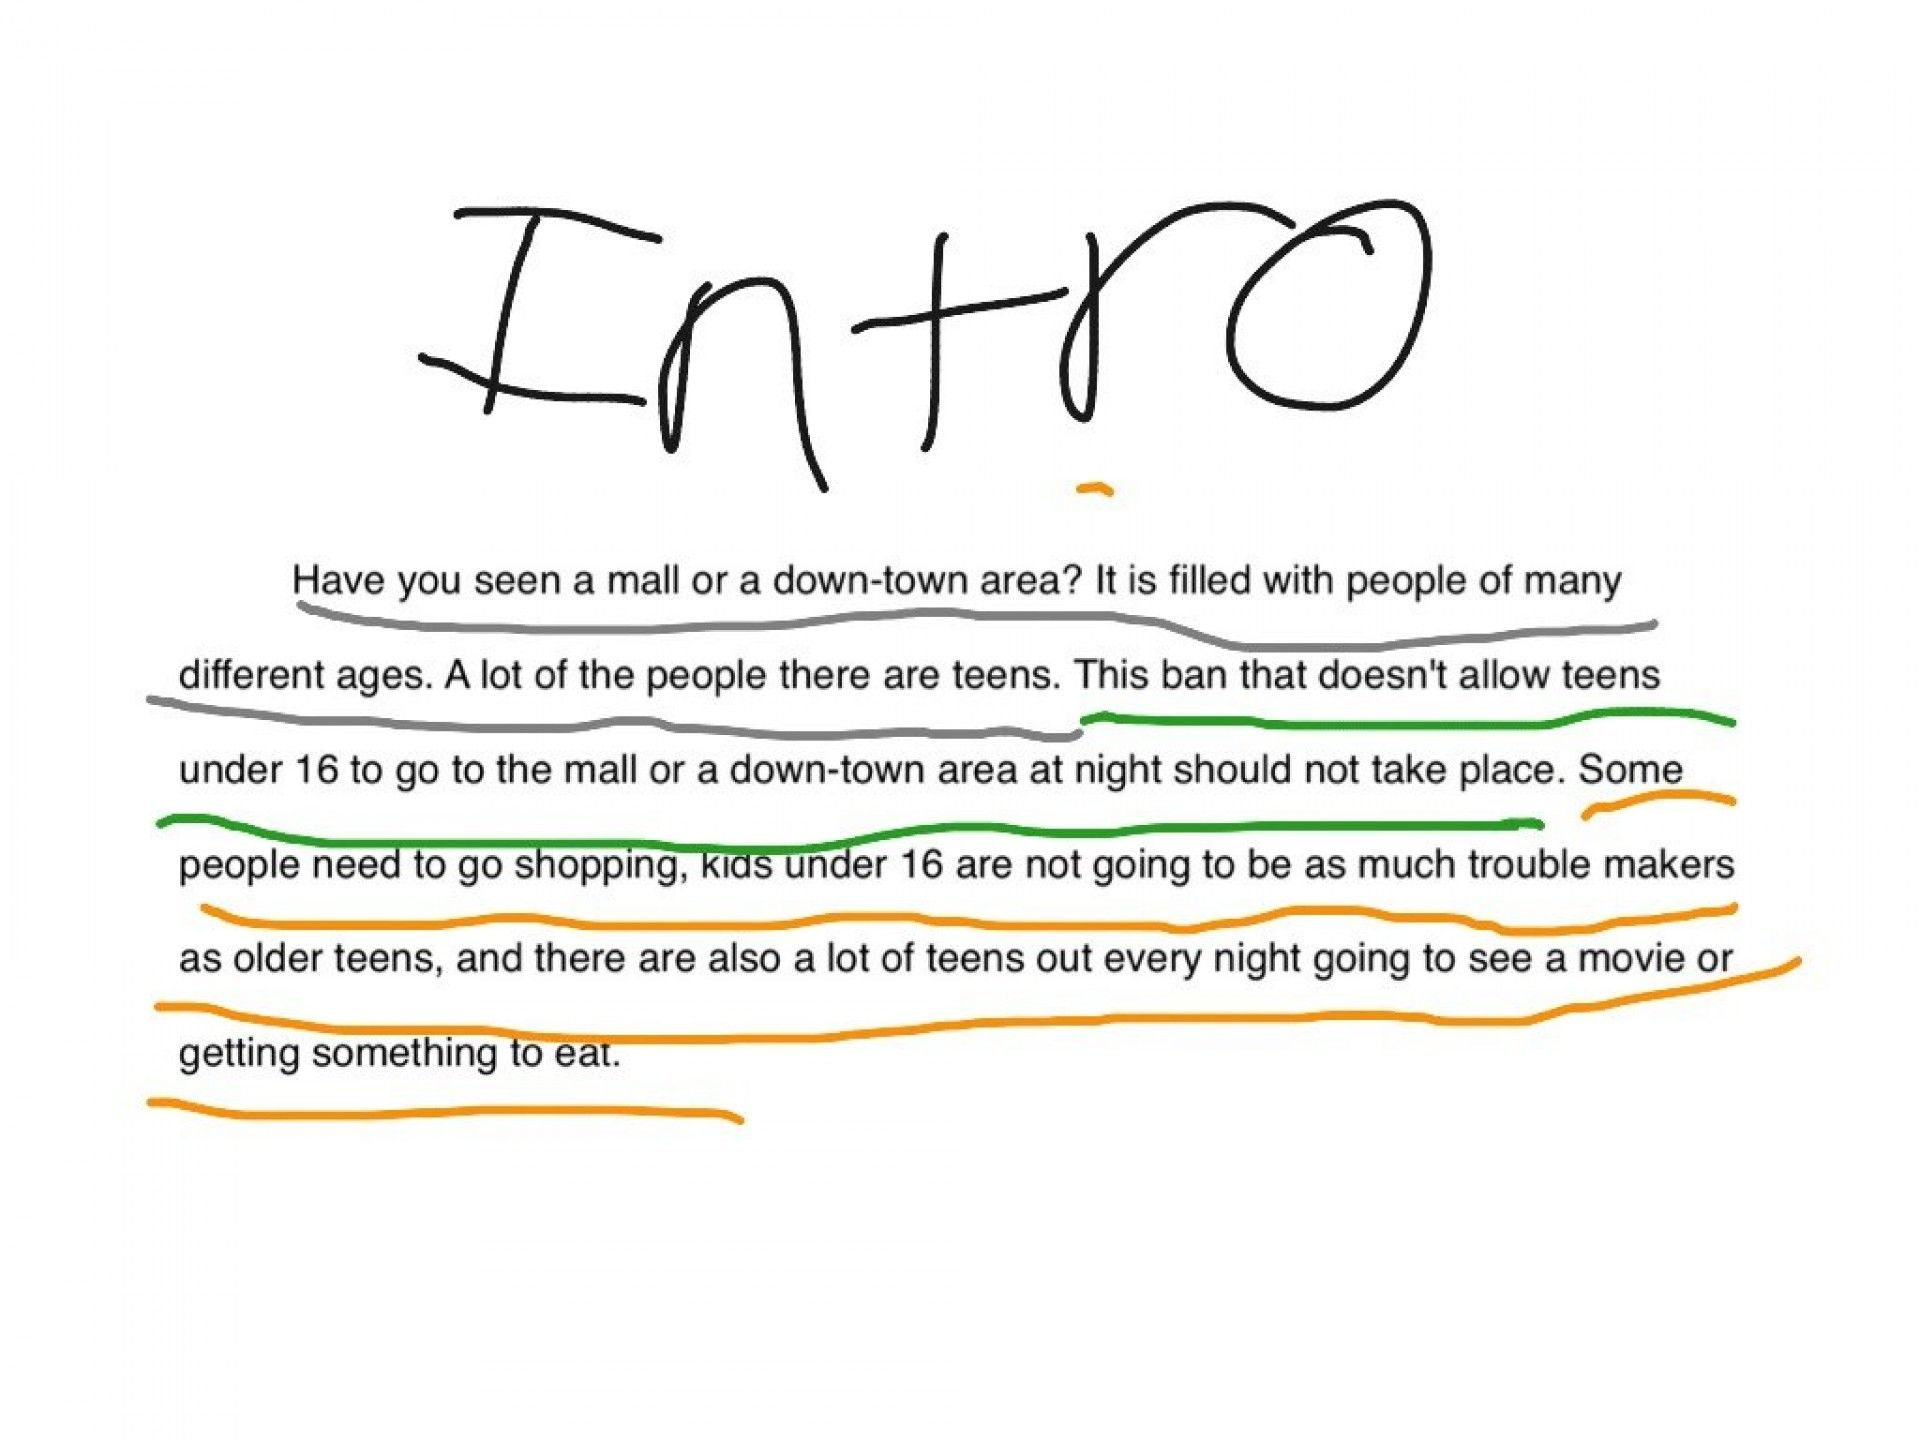 006 How To Write Good Hook For Anay Writing Hooks Interesting Topics Persuasive Photo What Goodinteresting